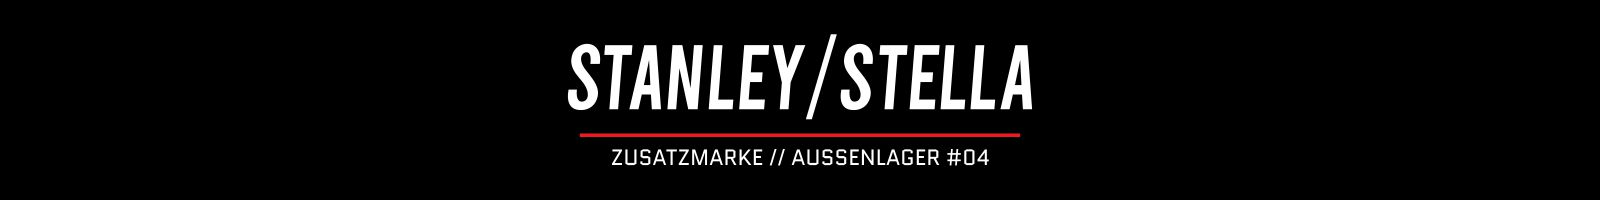 Kategorie-Marken => Stanley / Stella